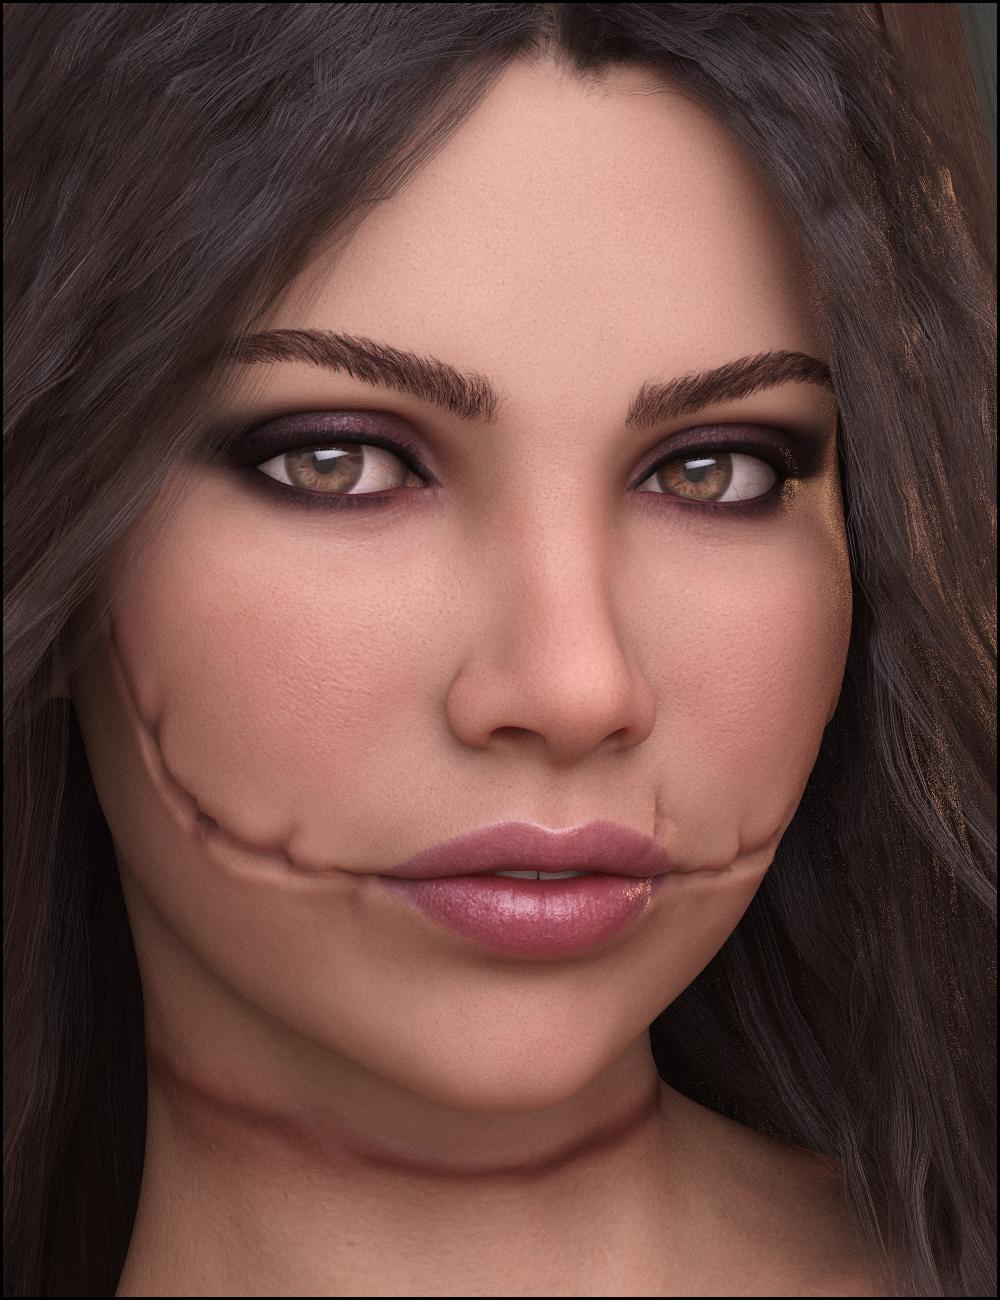 Emmeline for Genesis 8 Female by: DemonicaEviliusJessaii, 3D Models by Daz 3D